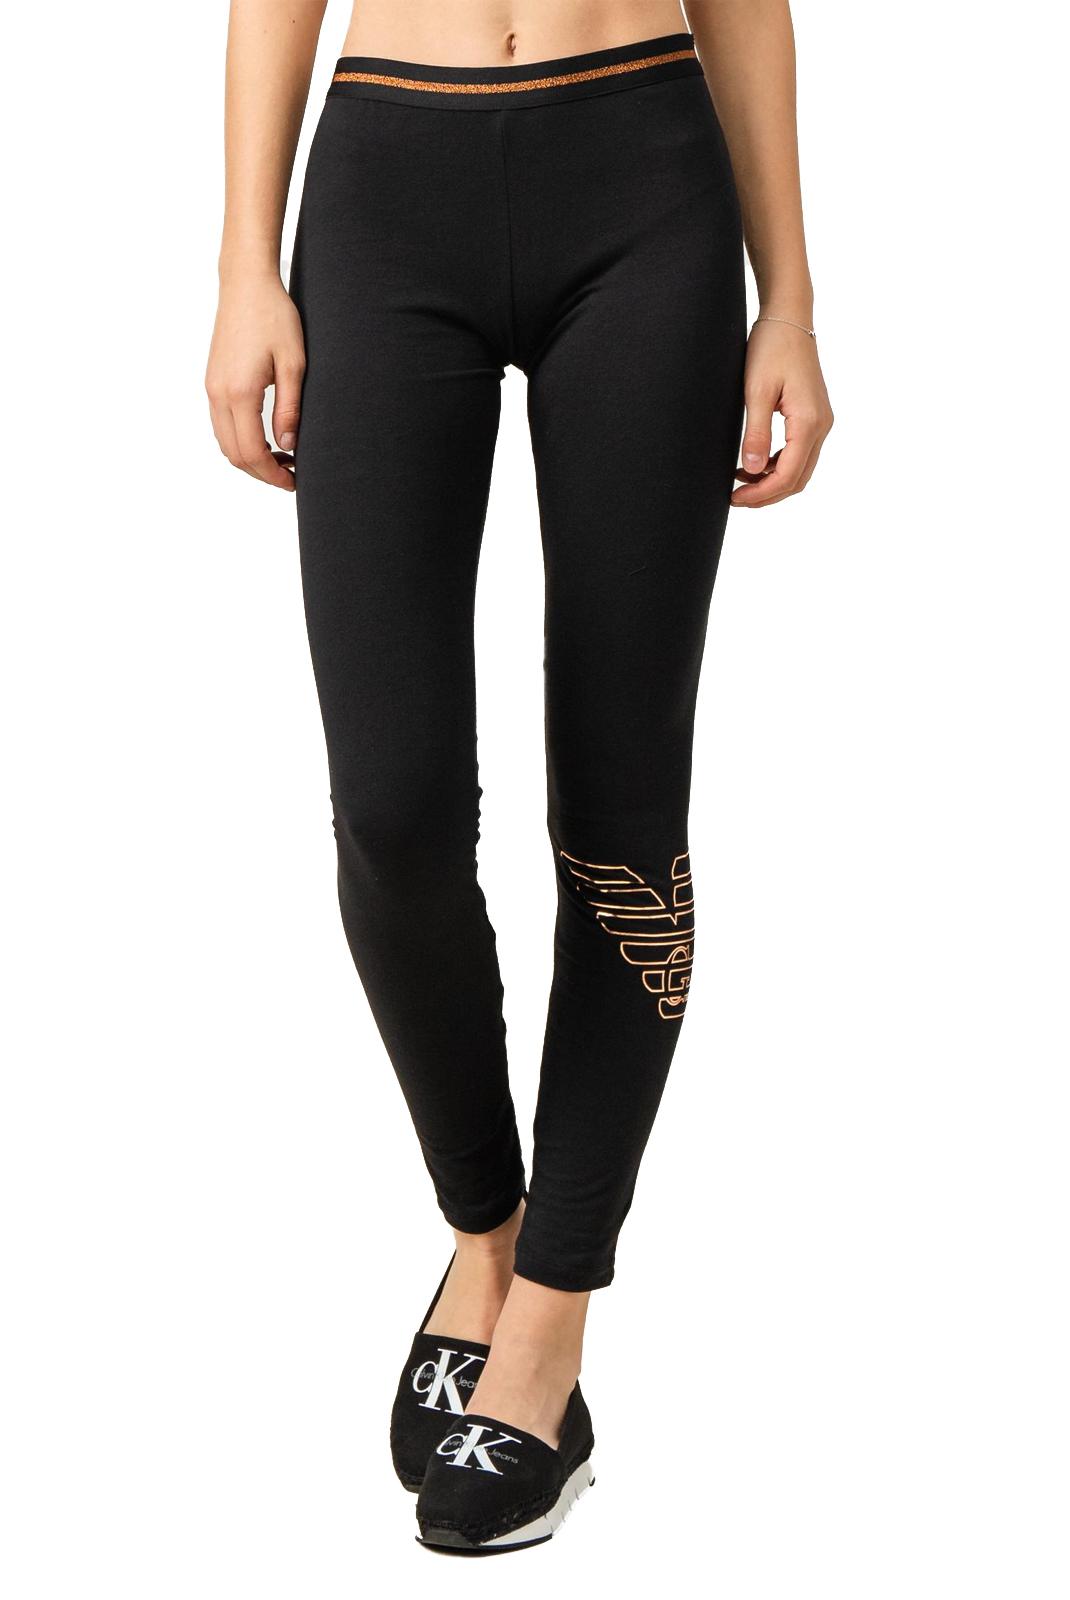 Pantalons  Emporio armani 164162 9A232 020 BLACK